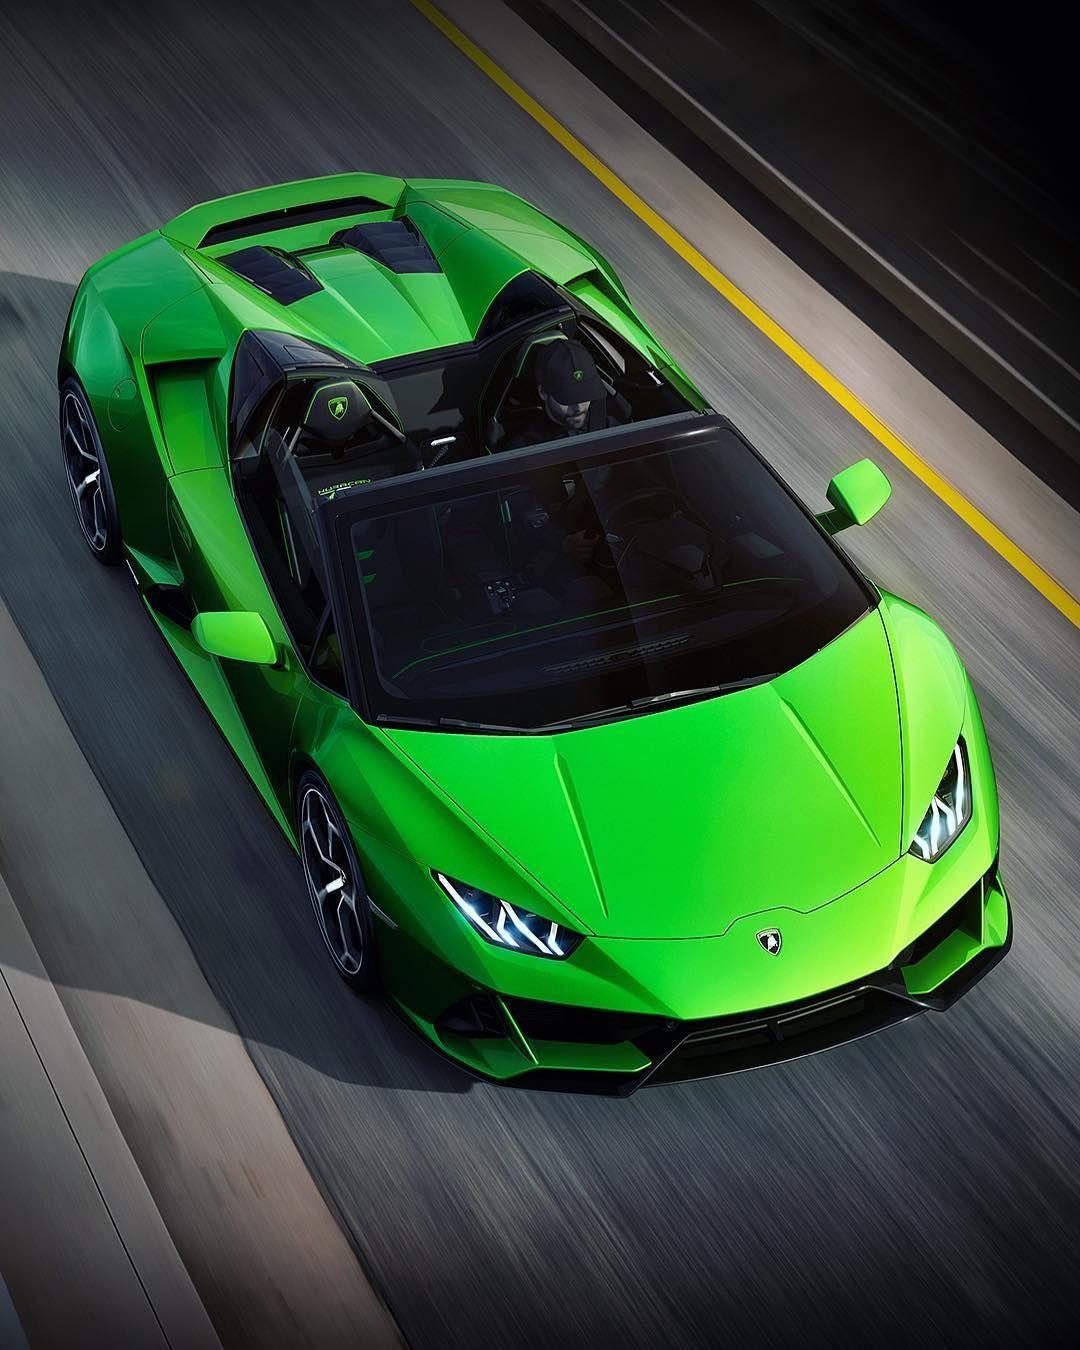 "Lamborghini Newport Beach On Instagram: ""Our New"